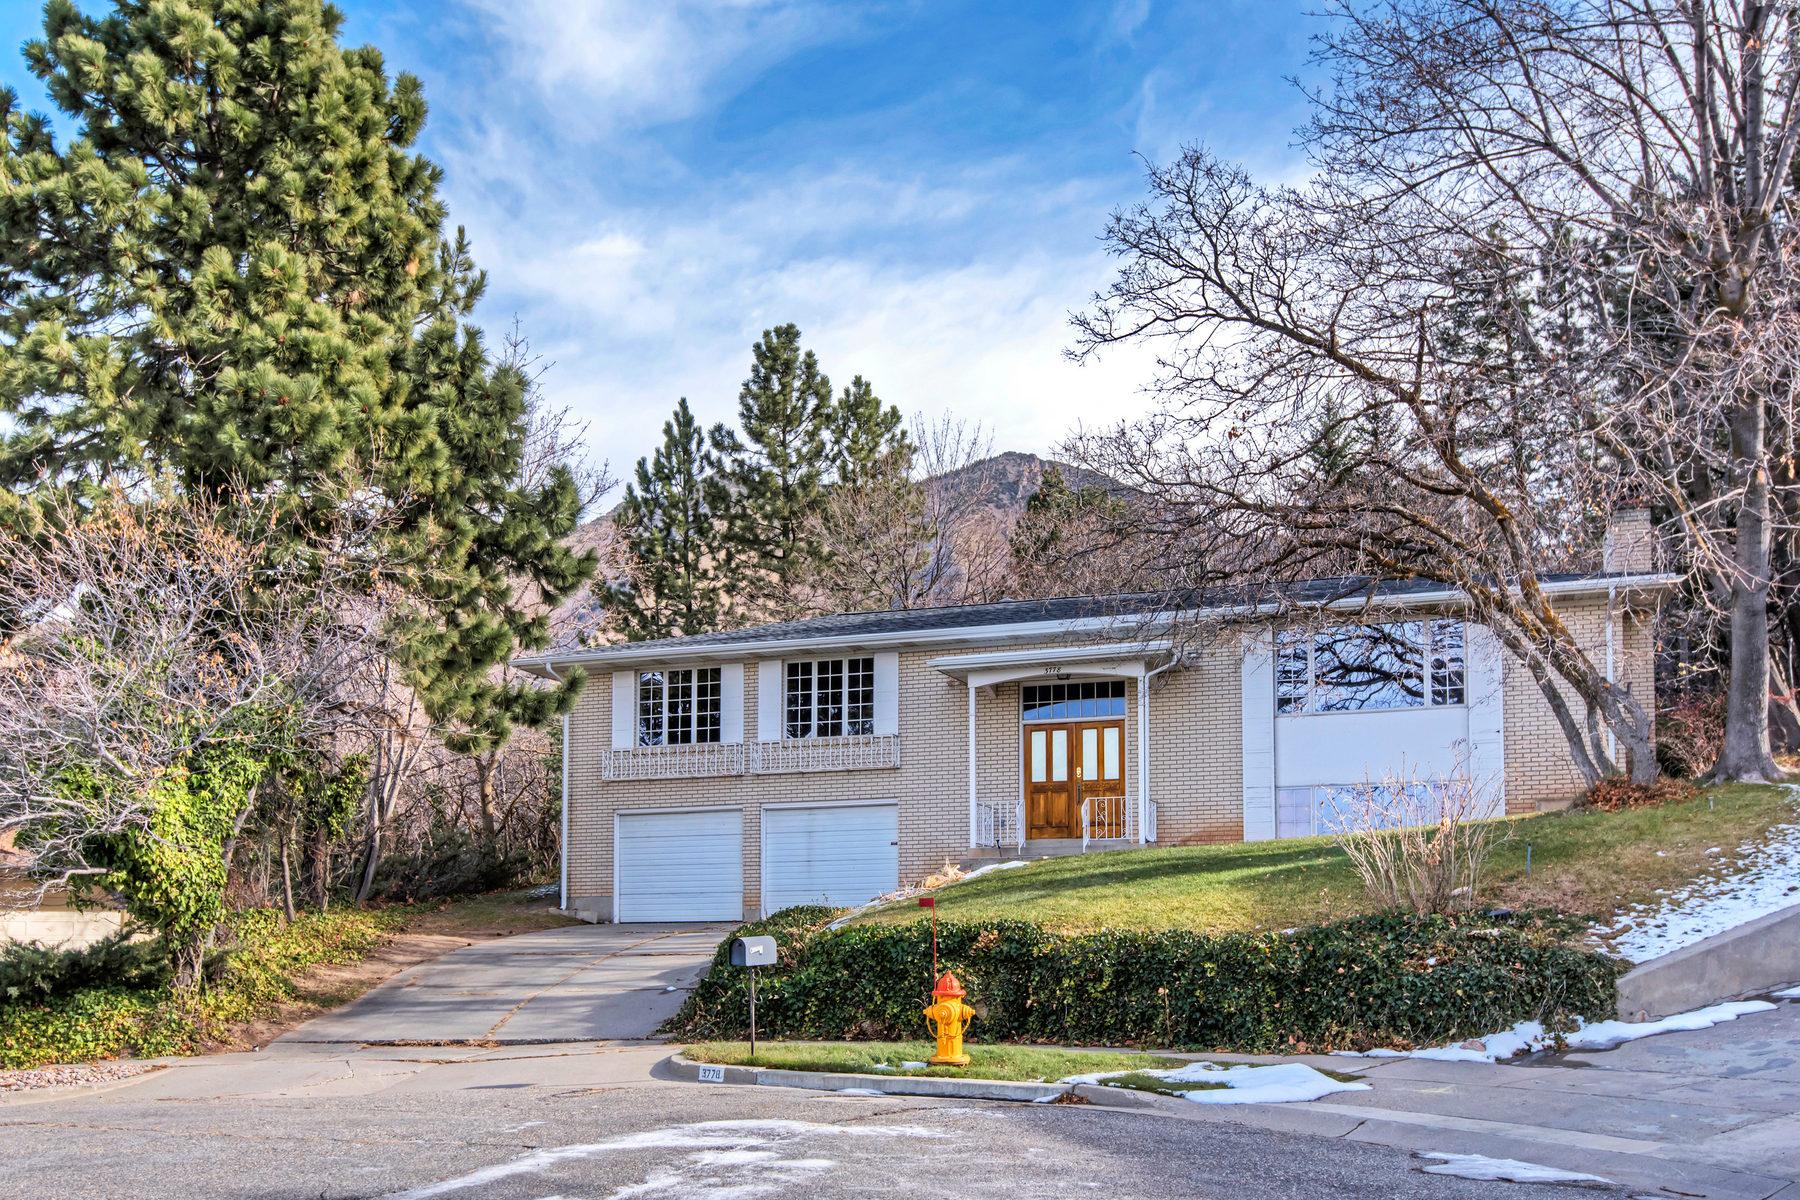 Single Family Home for Sale at Mt Olympus Living 3778 E Eastcliff Cir Salt Lake City, Utah 84124 United States